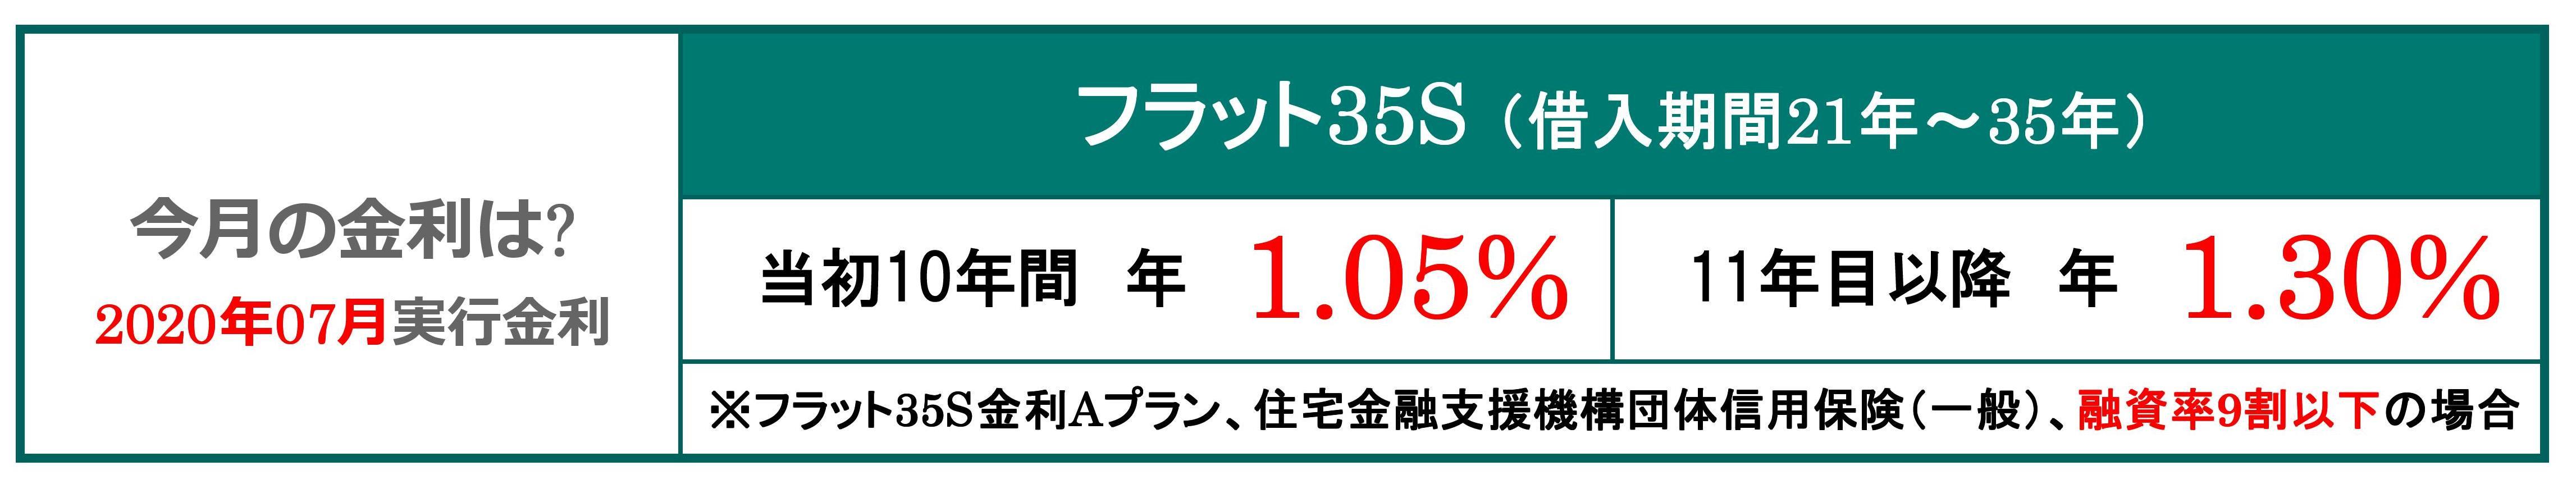 20200701kinri%20%281%29.jpg